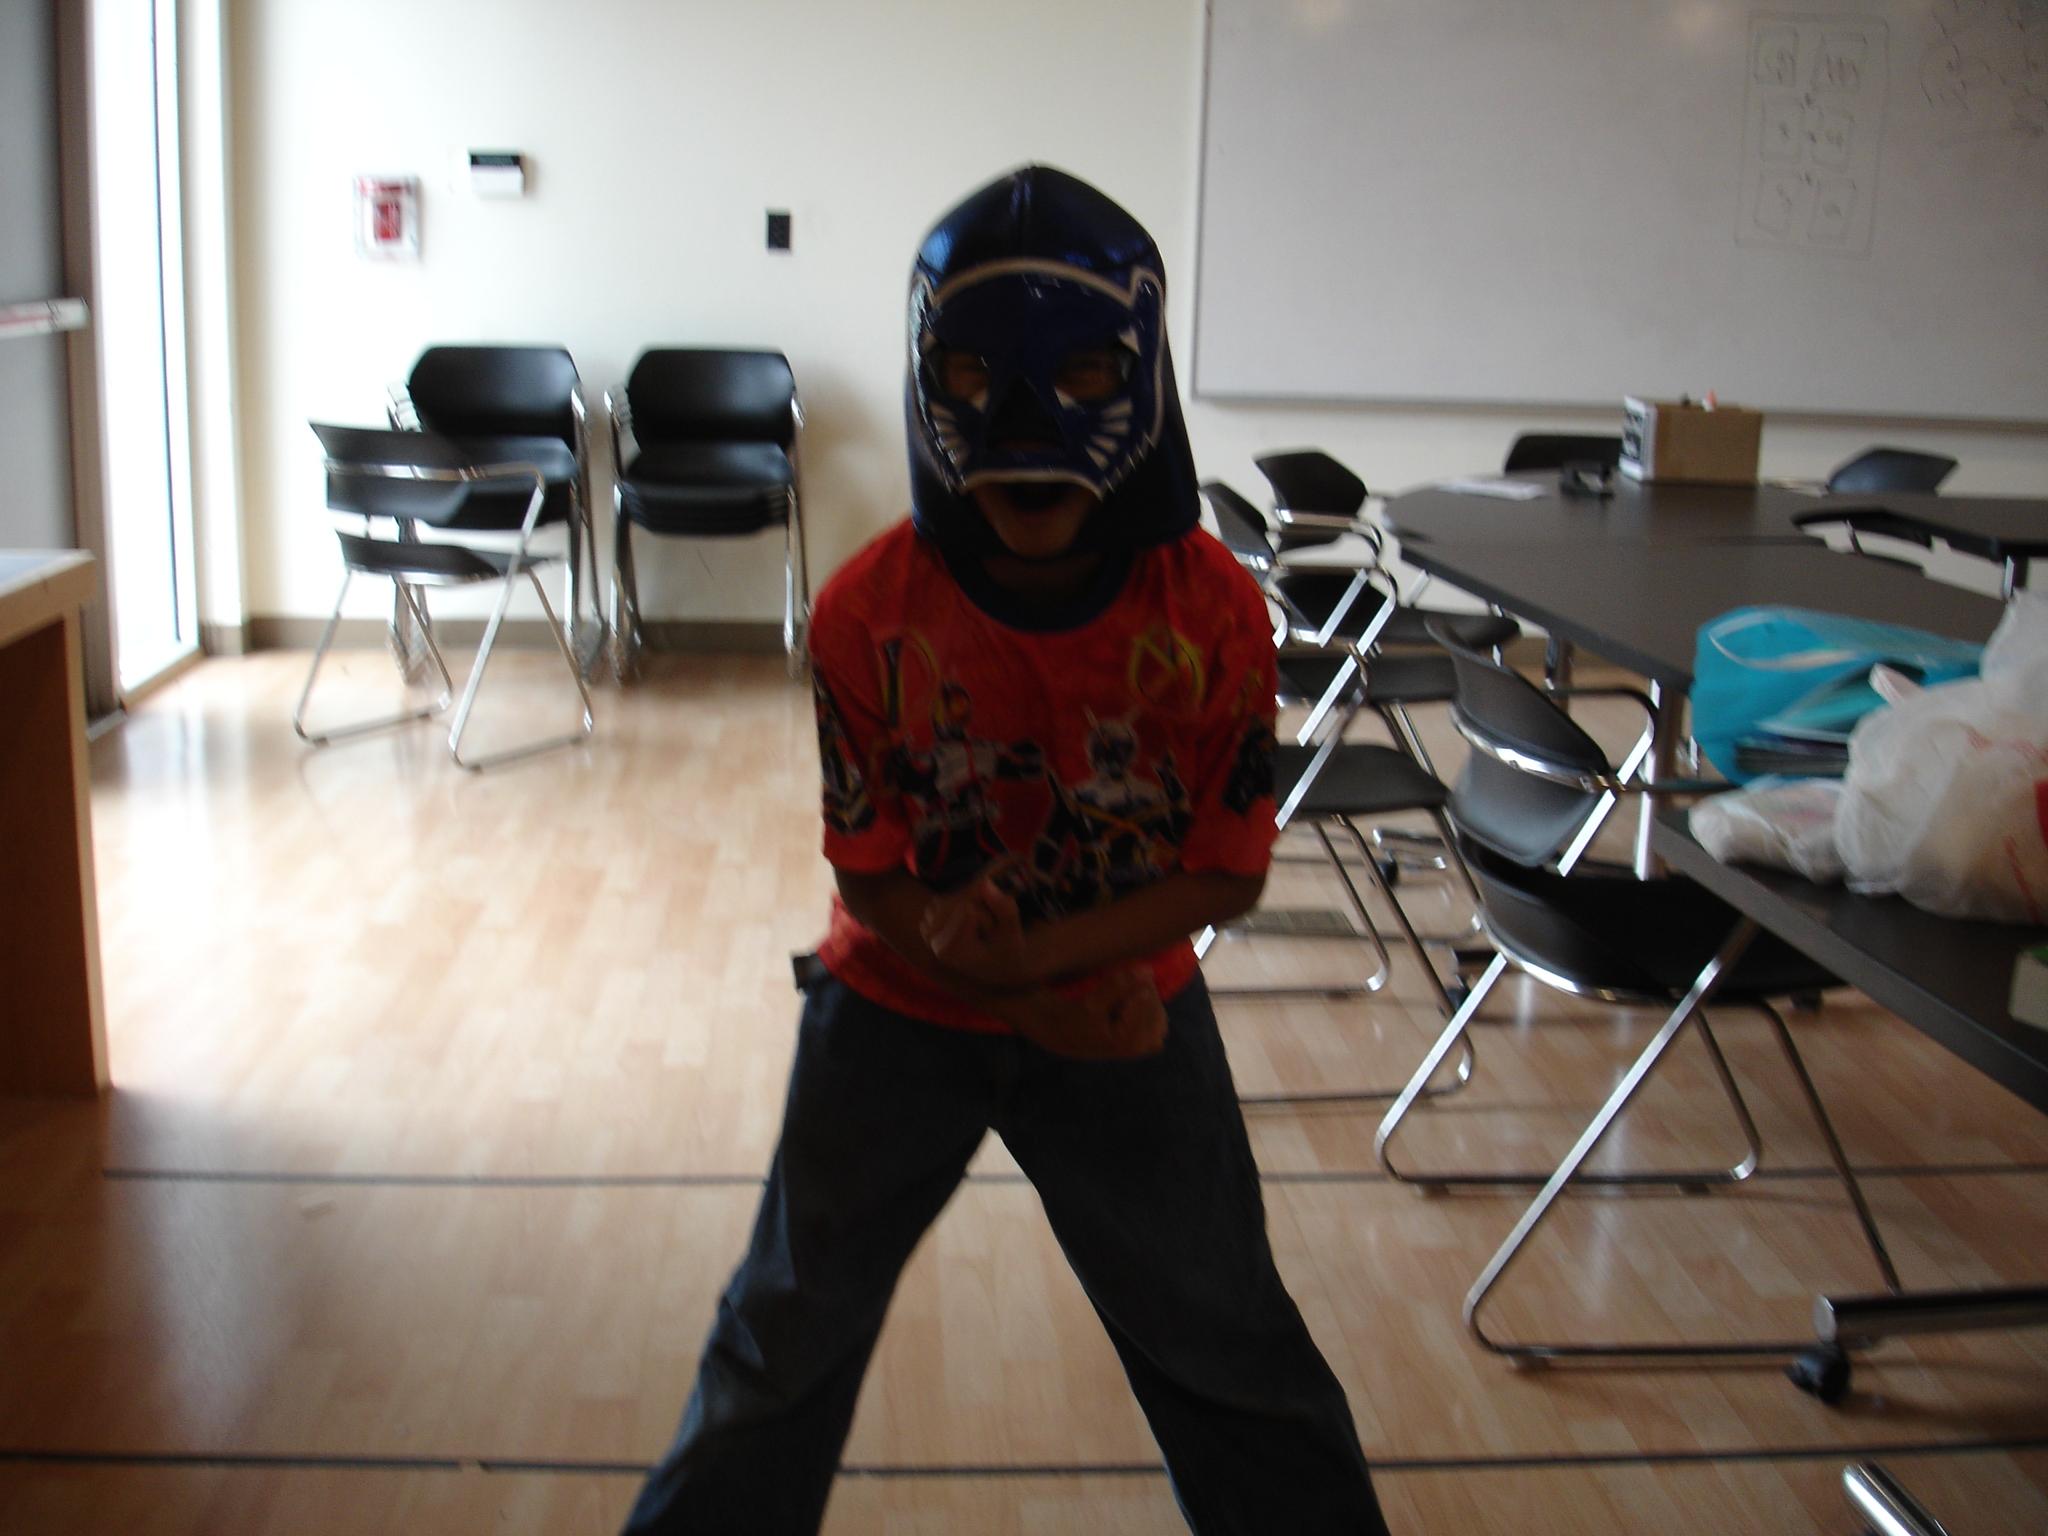 Borrowing Kenny's magical Lucha mask!